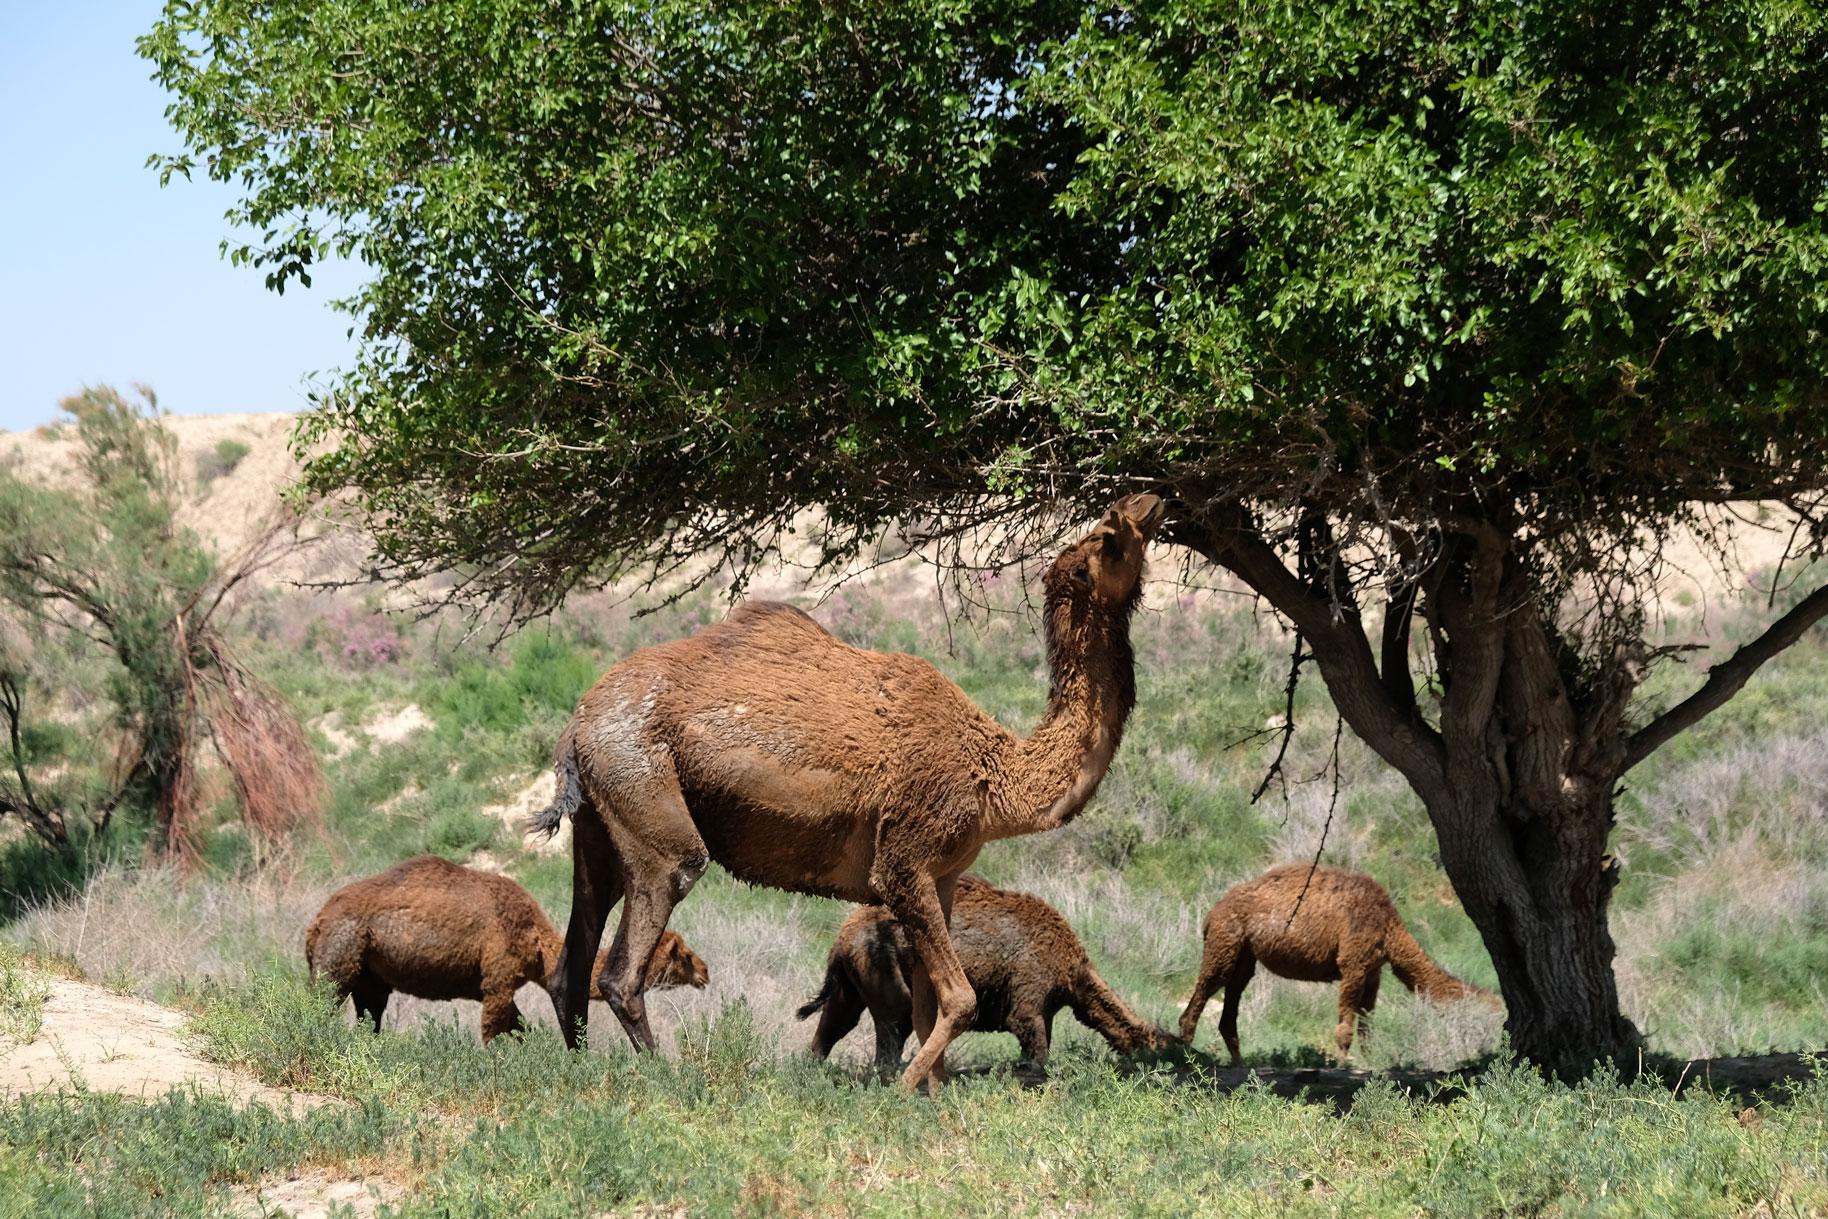 ...Kamele...